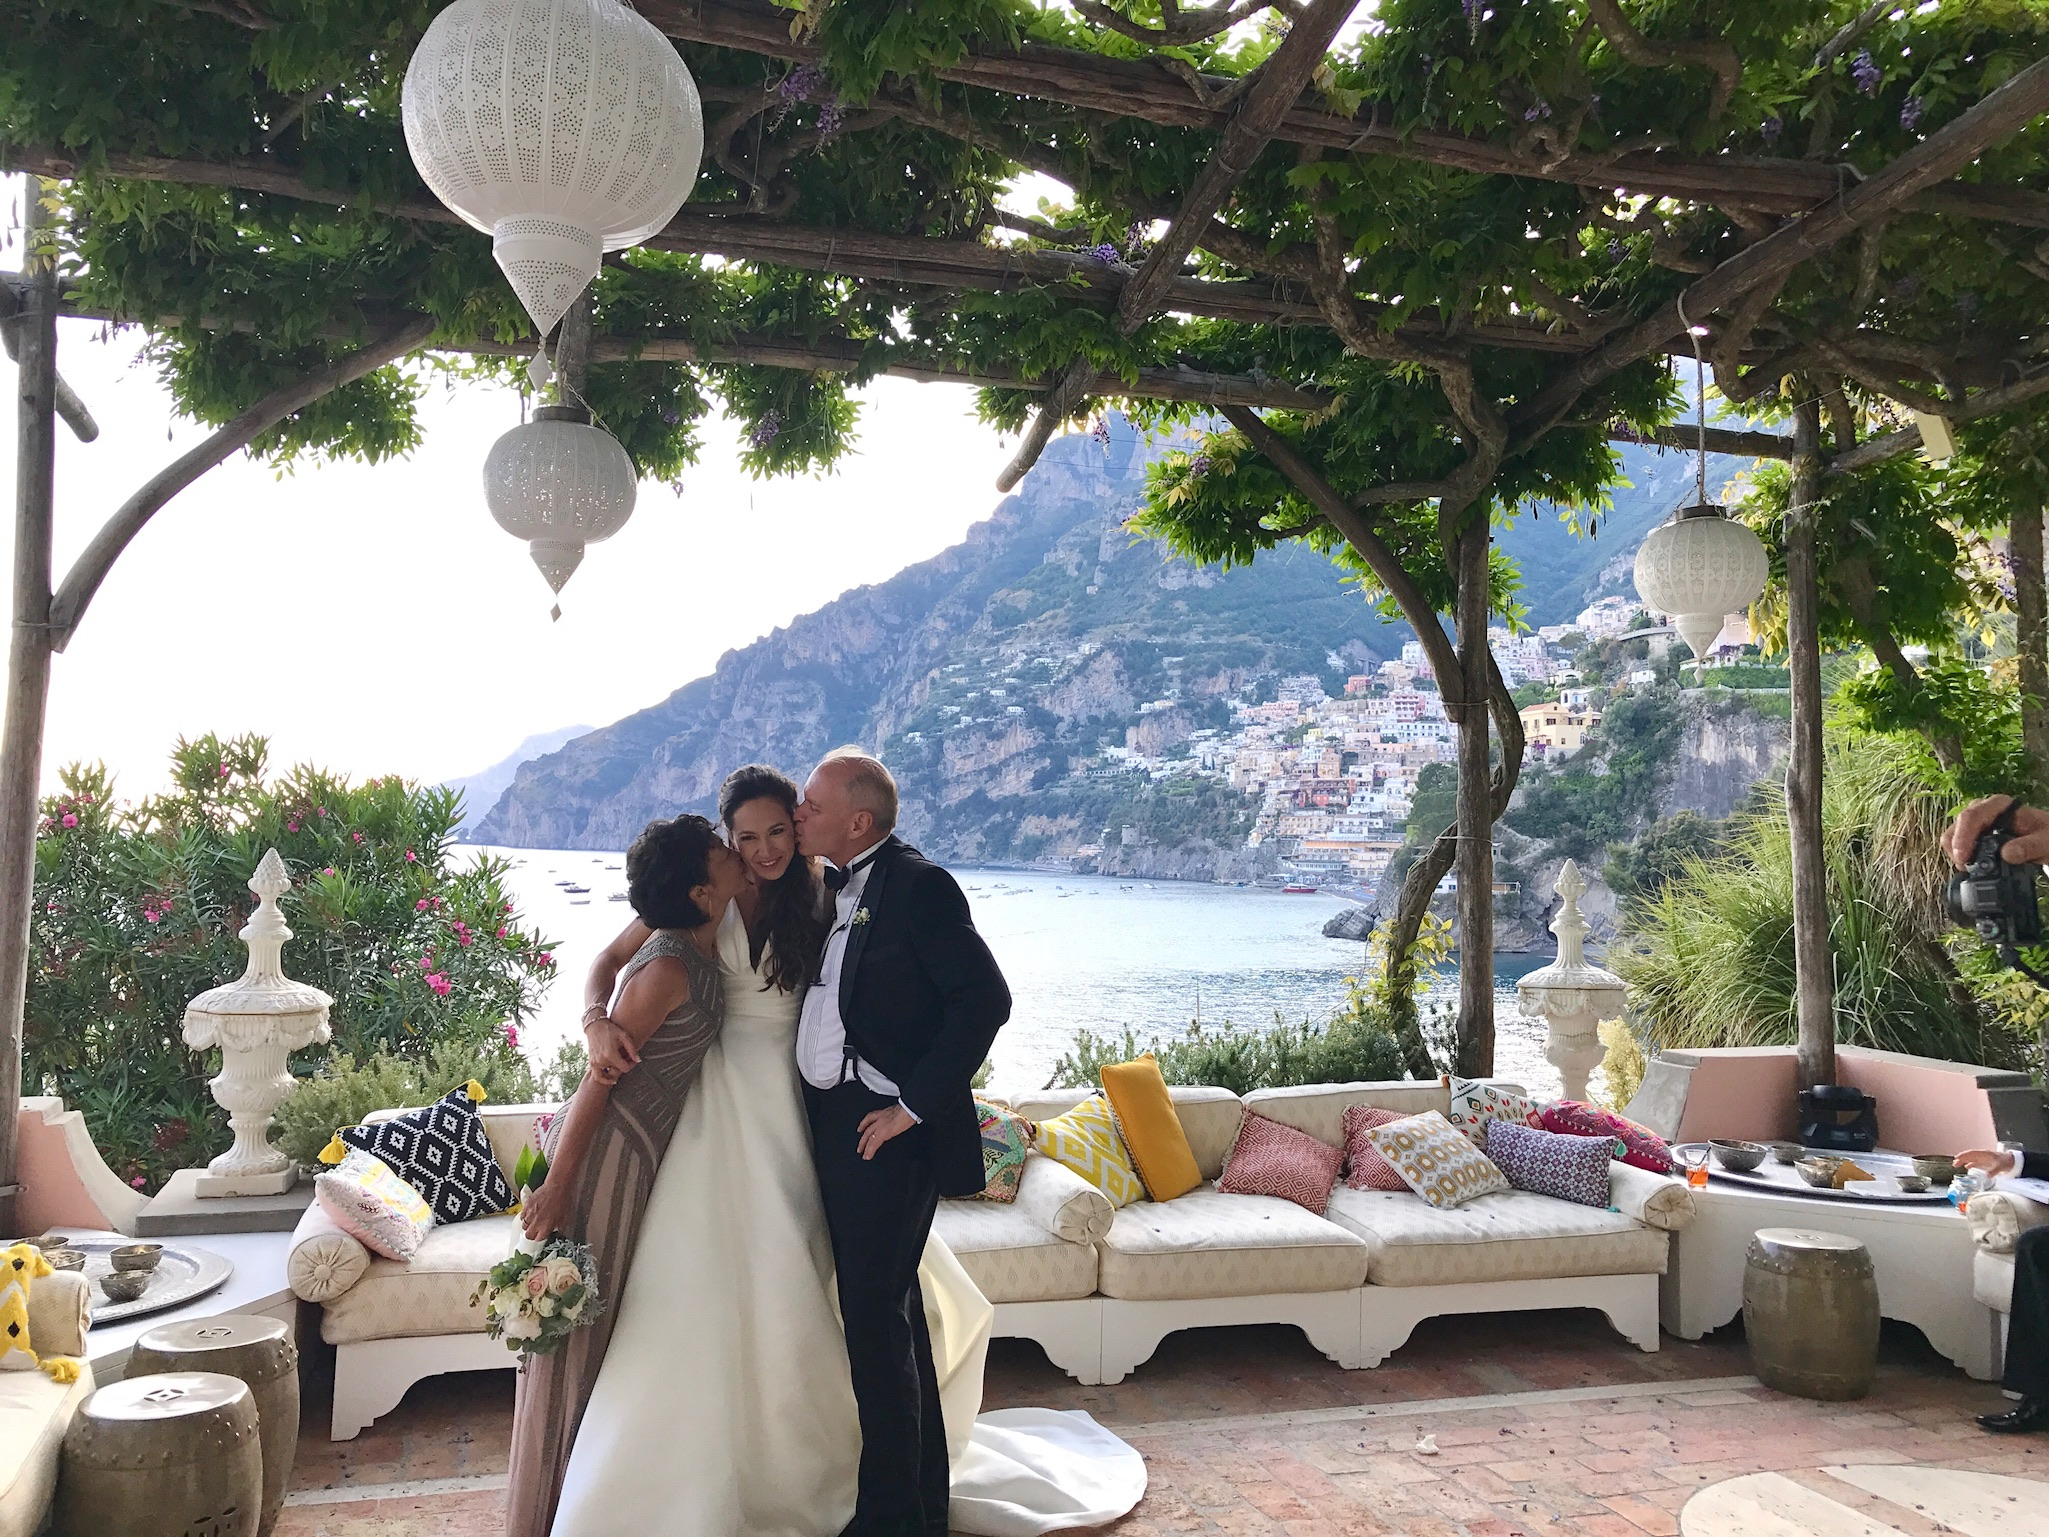 http://www.weddingamalfi.com/wp-content/uploads/Nathalie-and-Benjamin-Wedding-in-Positano-Italy-10.jpg